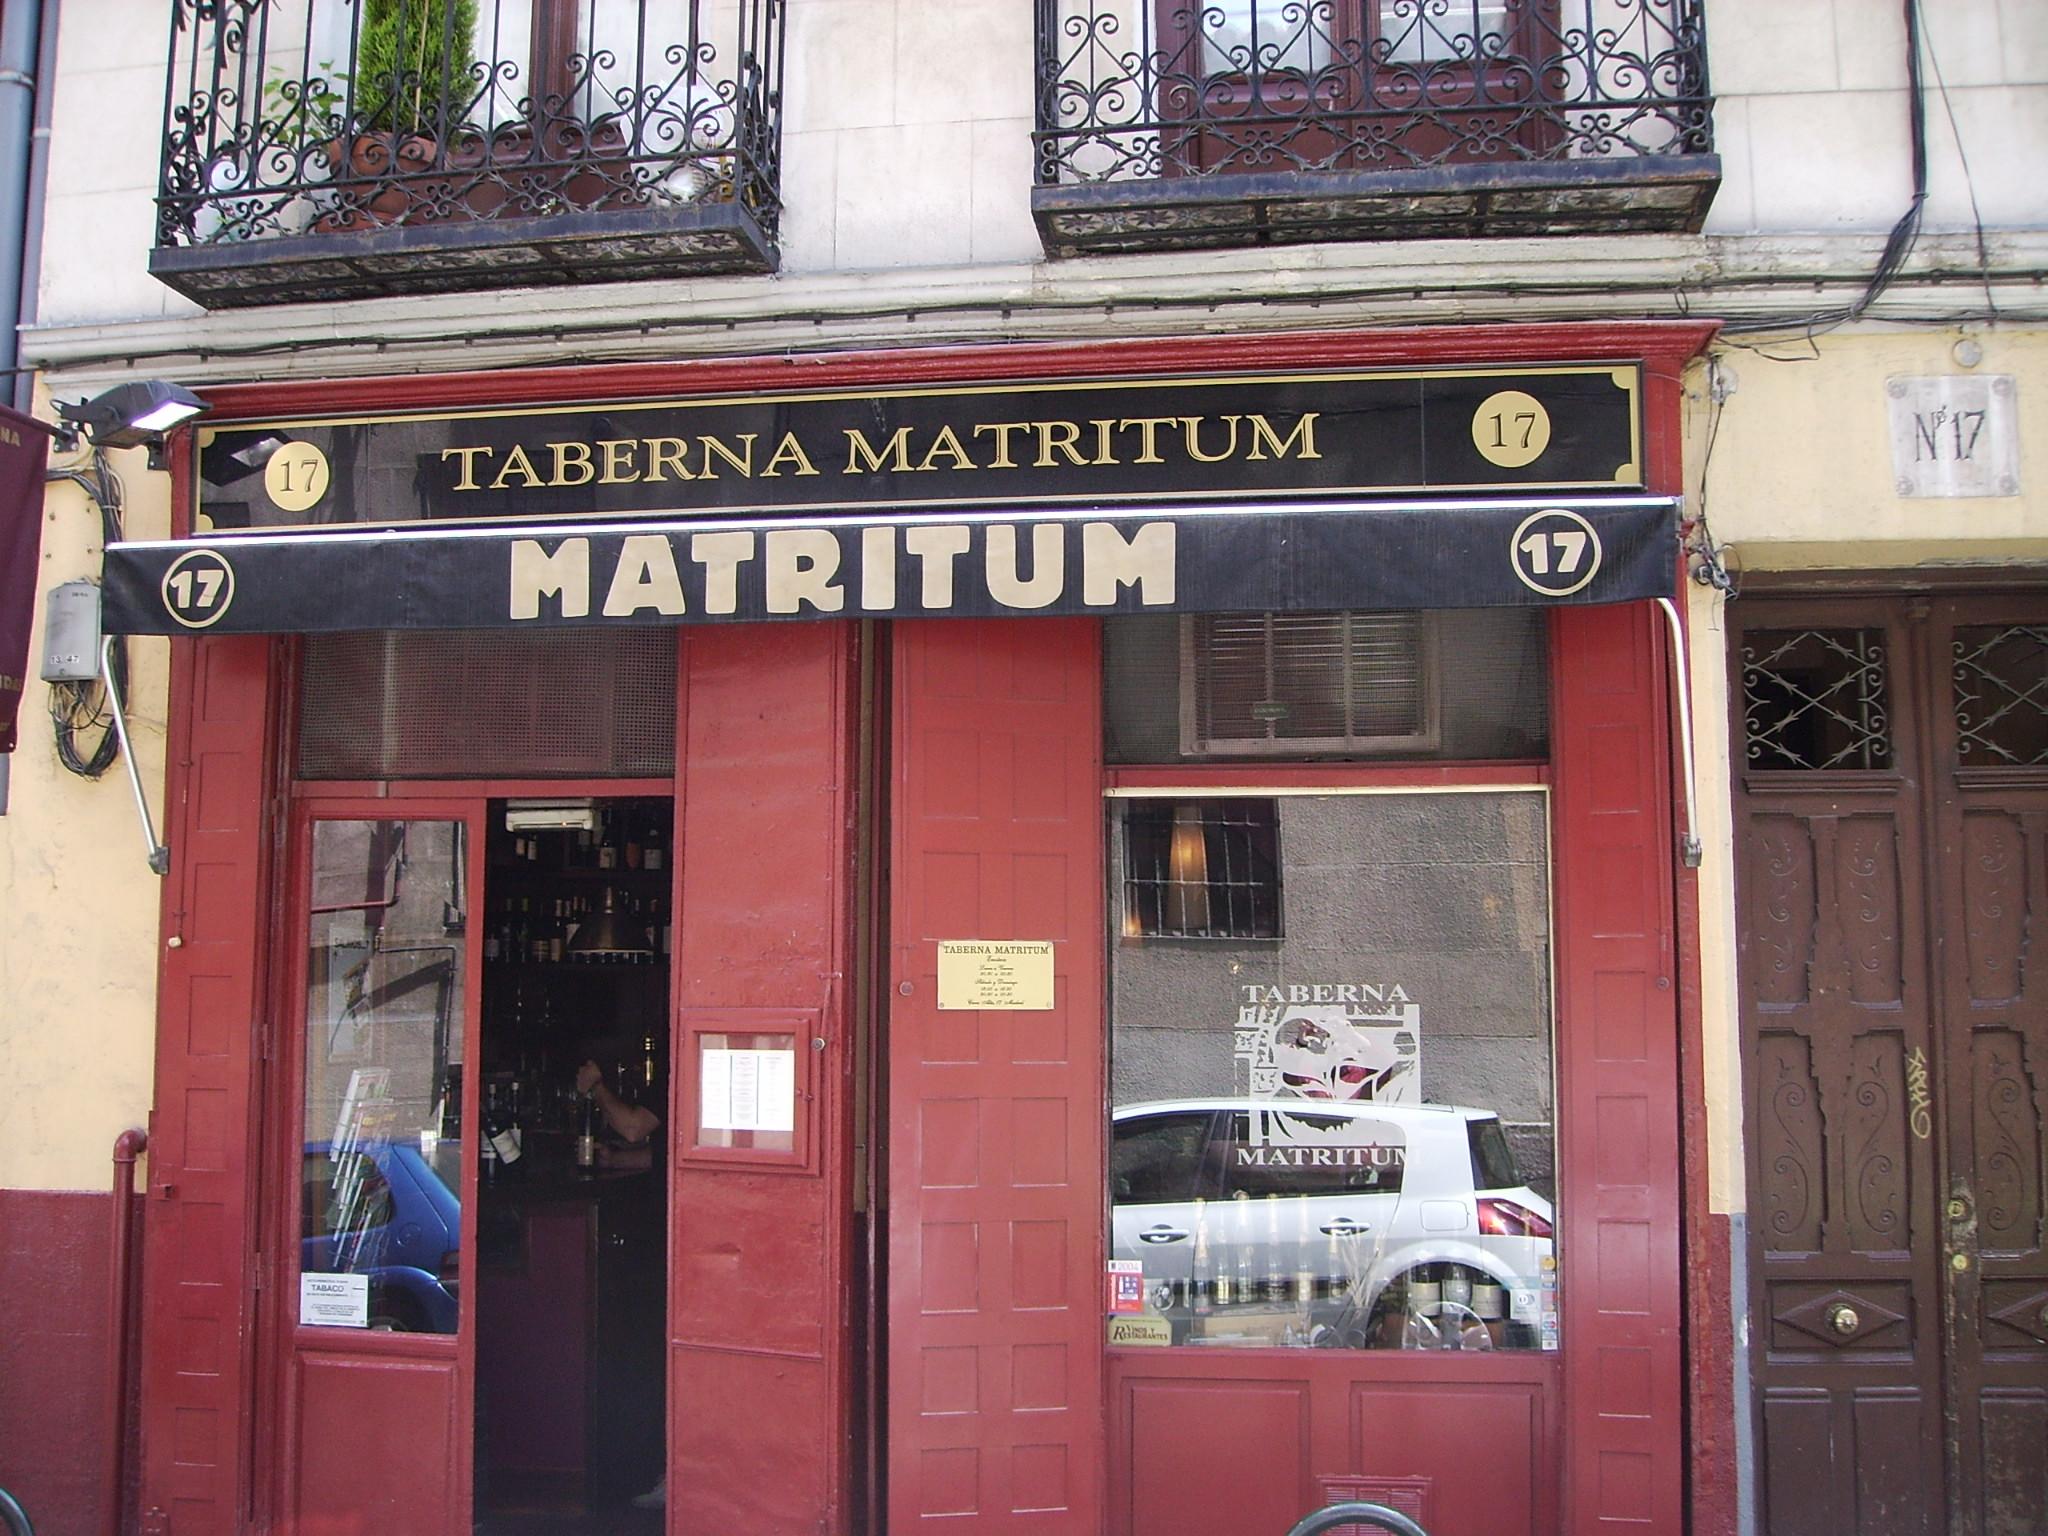 Taberna Matritum